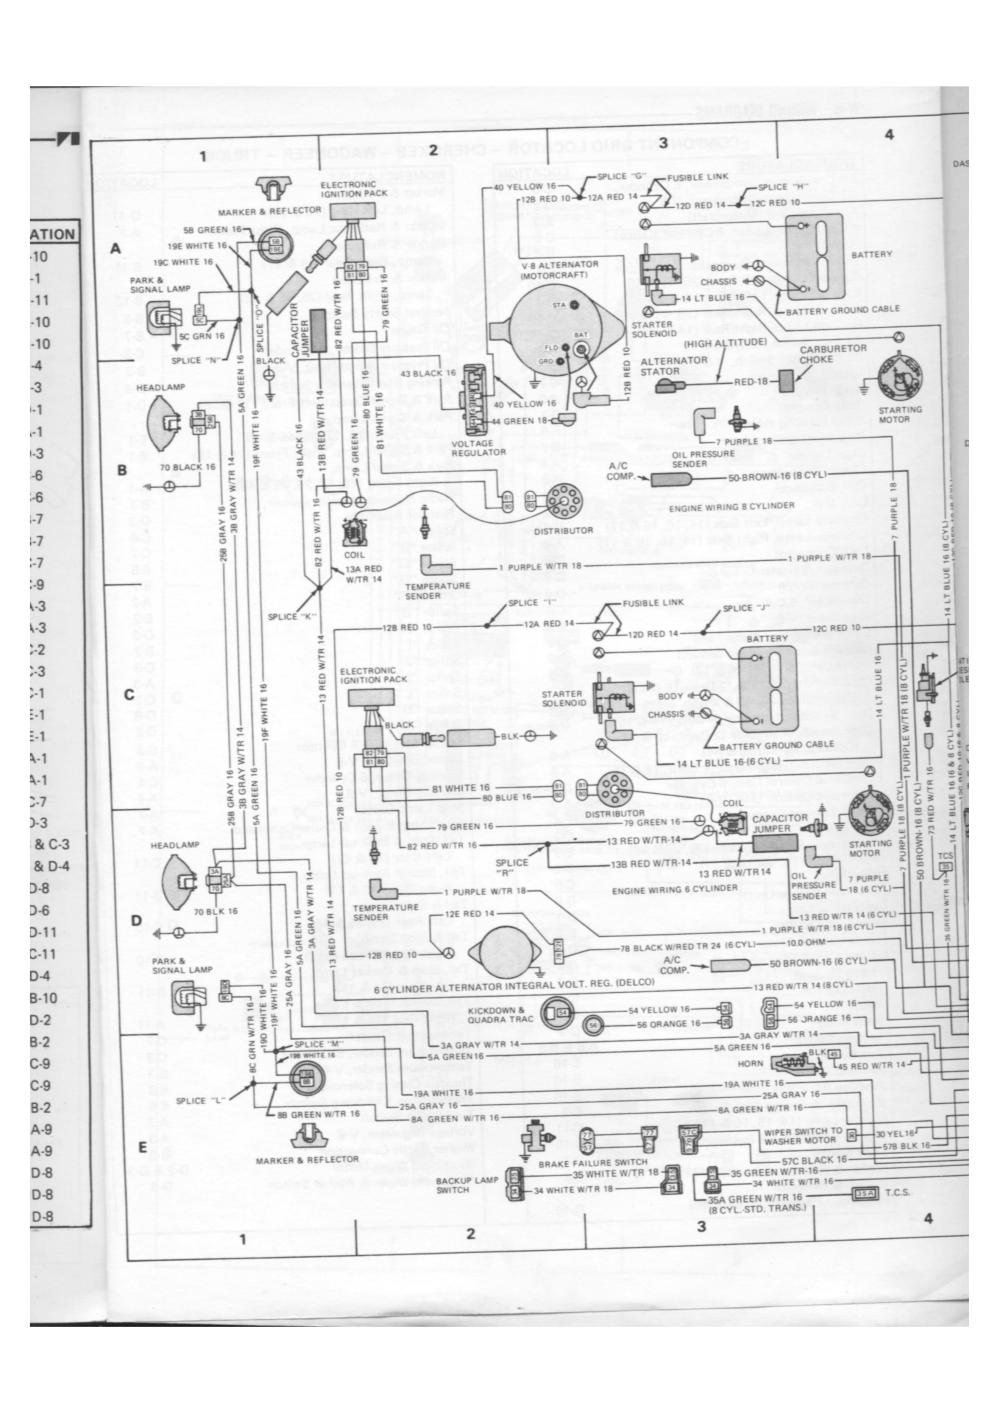 medium resolution of jeep wrangler cj wiring diagram i want a jeep 1982 jeep cj wiring diagram 1984 jeep cj wiring diagram